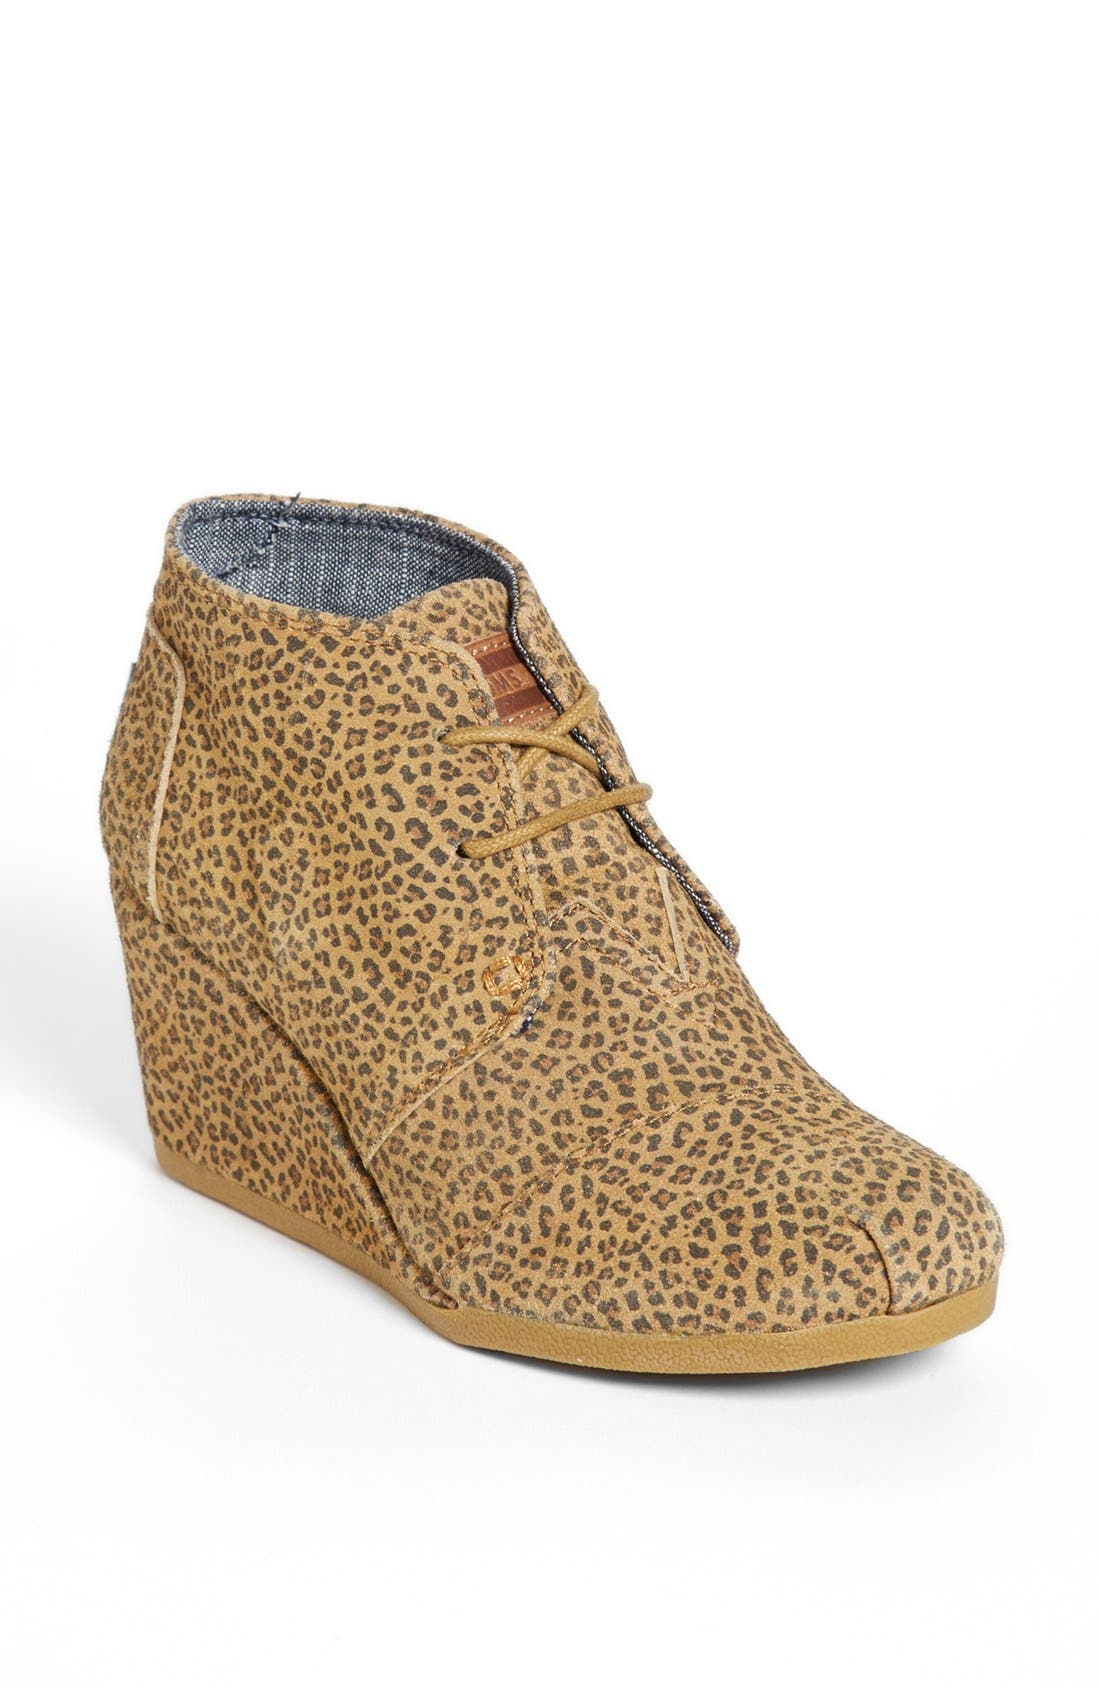 Alternate Image 1 Selected - TOMS 'Desert - Cheetah' Suede Wedge Bootie